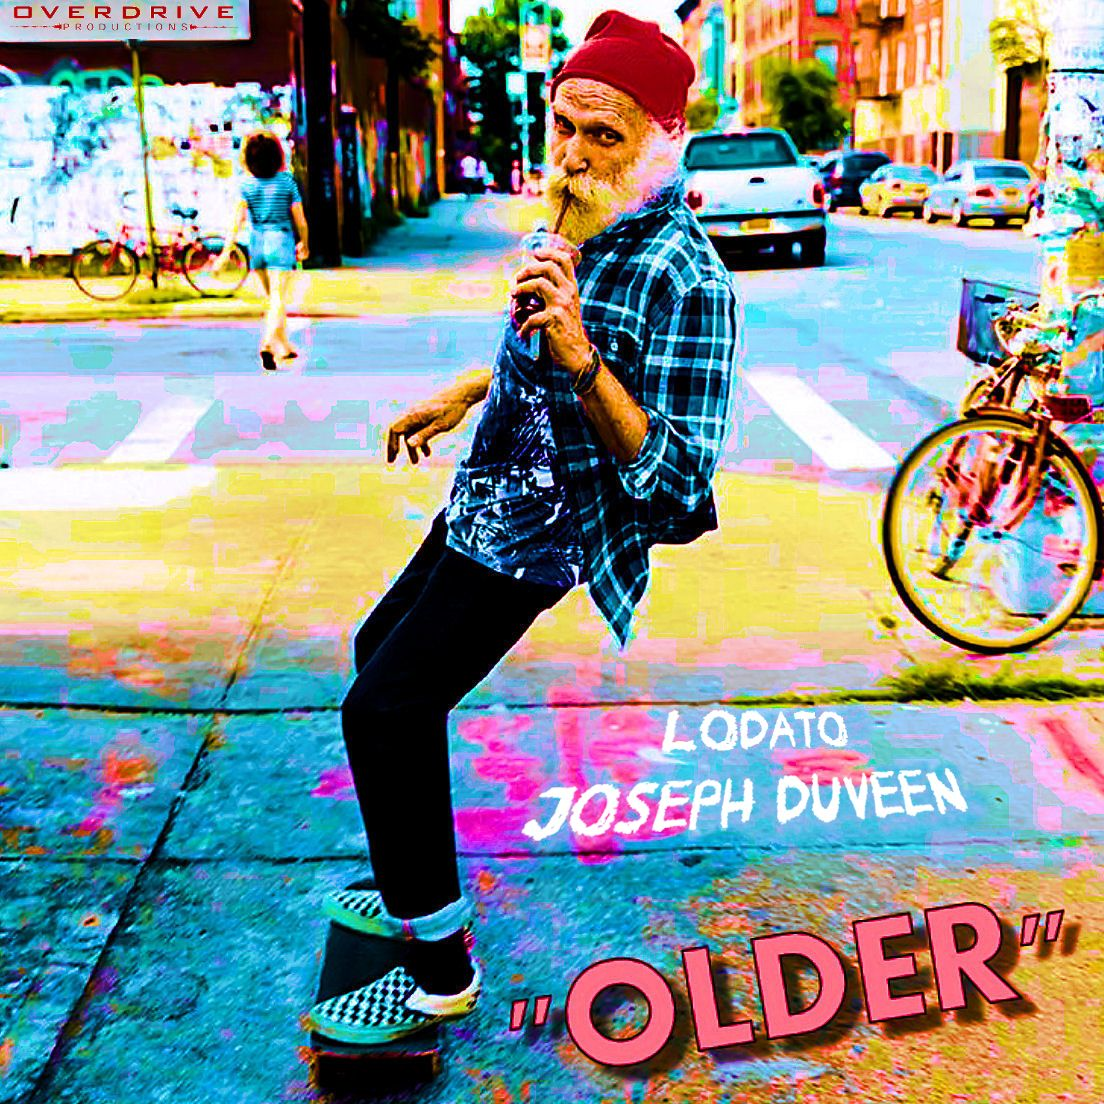 lodato_joseph_duveen_-_older.jpg